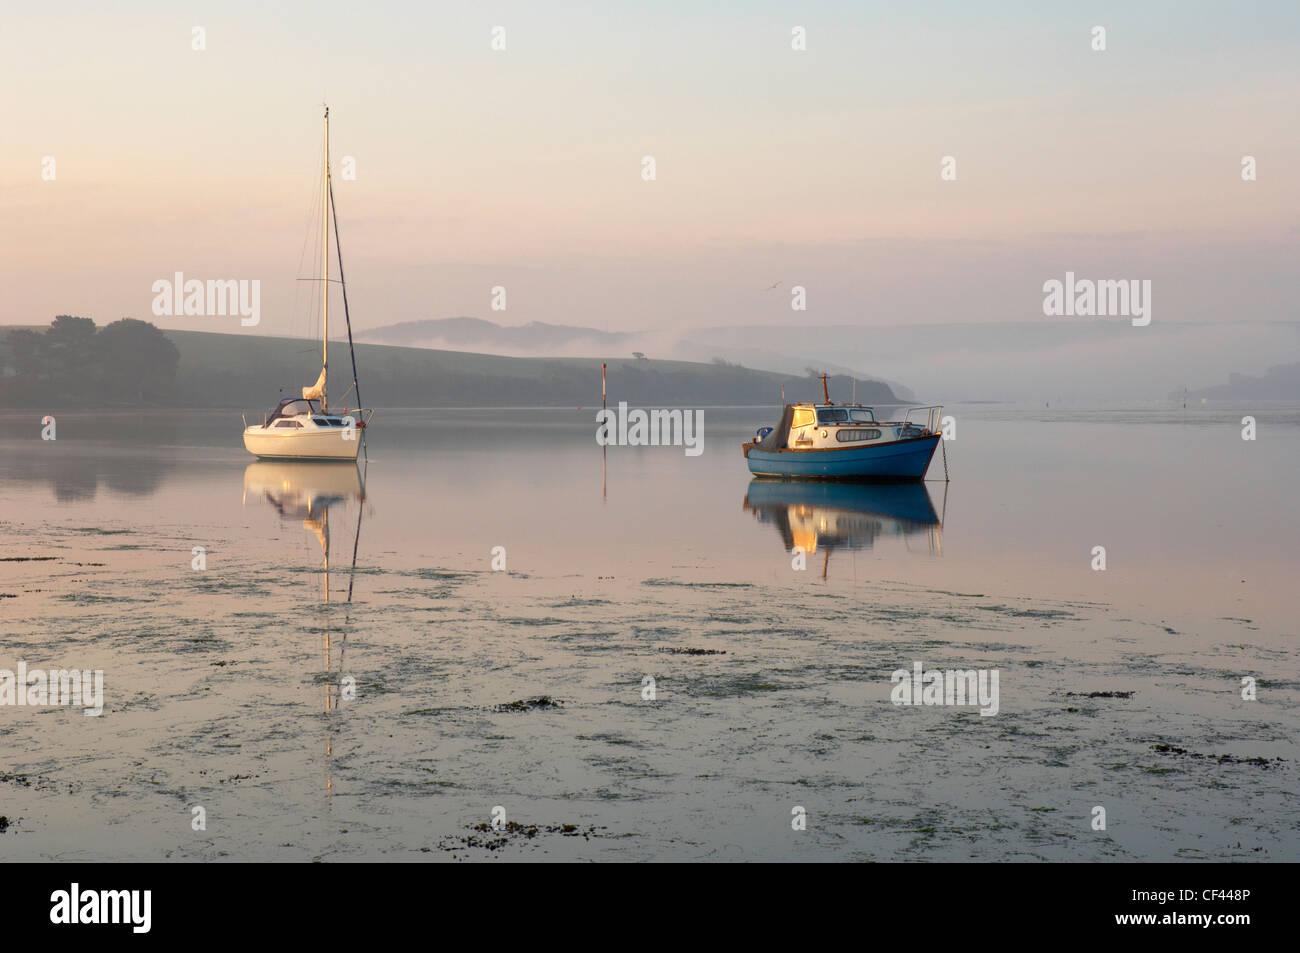 Misty dawn light on the Kingsbridge estuary illuminating small dinghys and fishing boats. - Stock Image